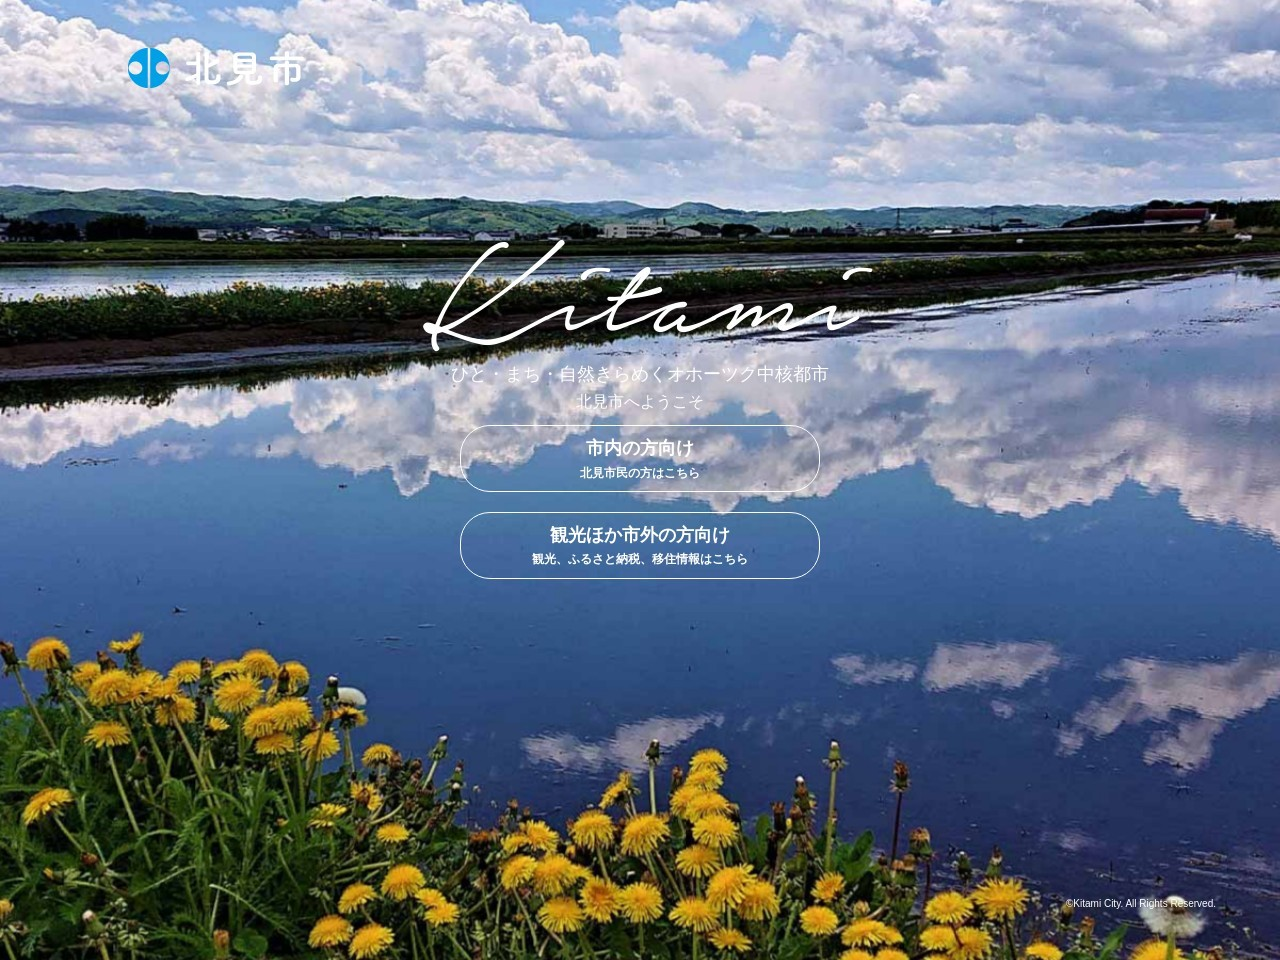 http://www.city.kitami.lg.jp/docs/2016101400036/